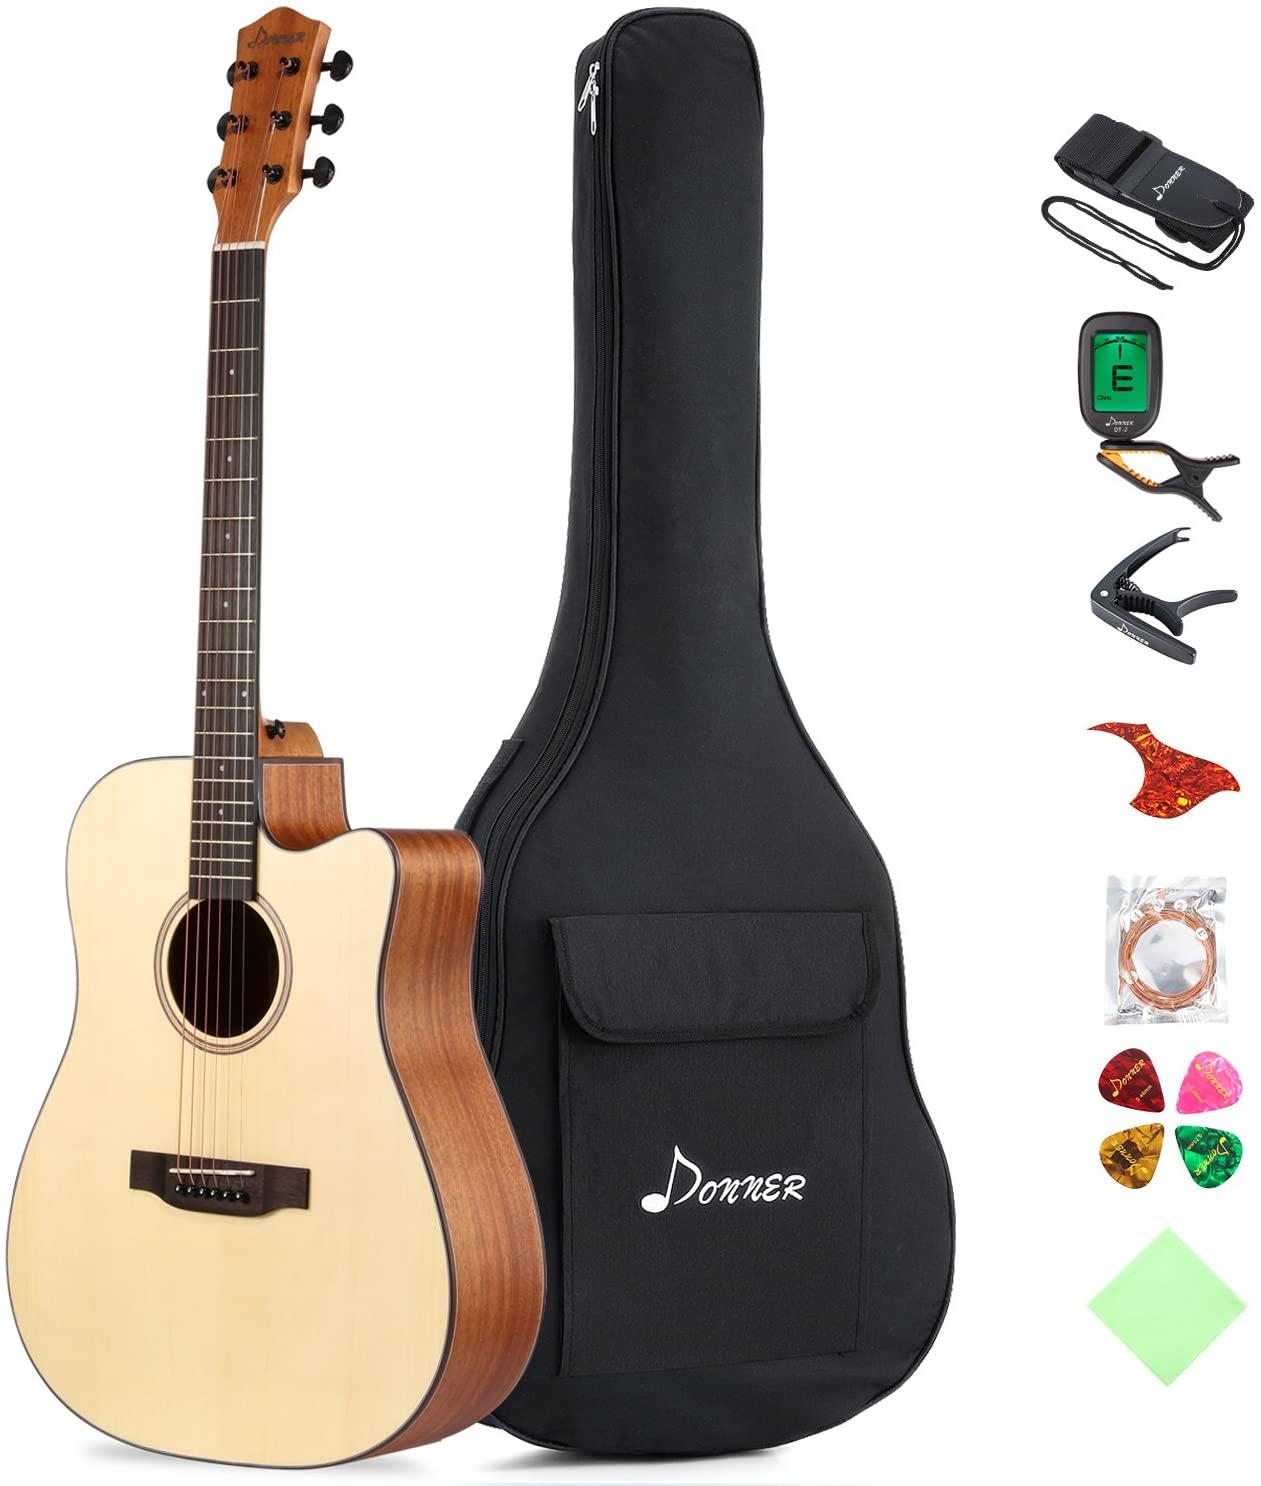 "Donner DAG-1C Beginner Acoustic Guitar Full Size, 41"" Cutaway Guitar Bundle with Gig Bag Tuner Capo Picks Strap String"